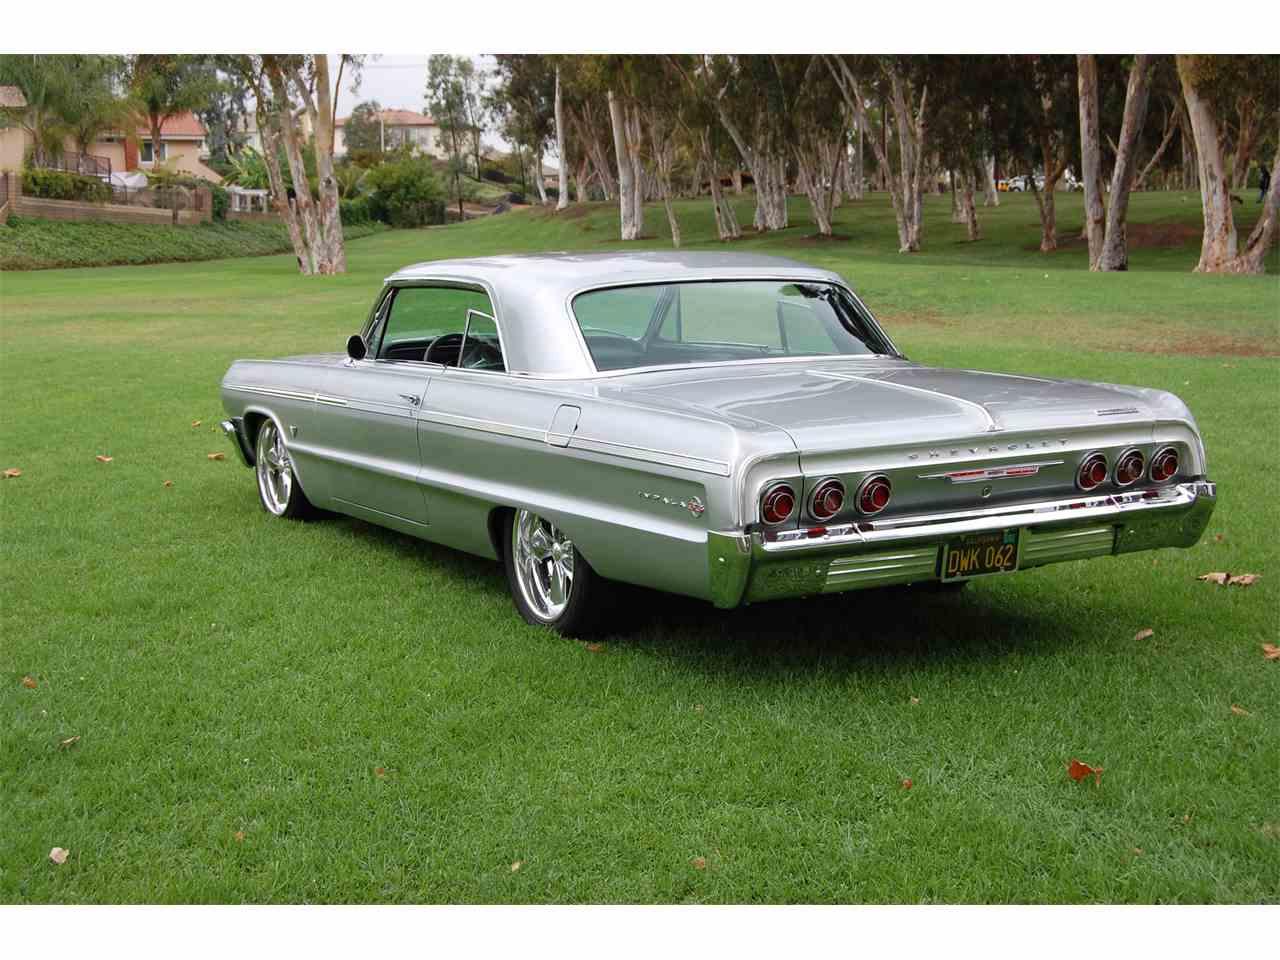 1964 chevrolet impala ss for sale cc 1044556. Black Bedroom Furniture Sets. Home Design Ideas